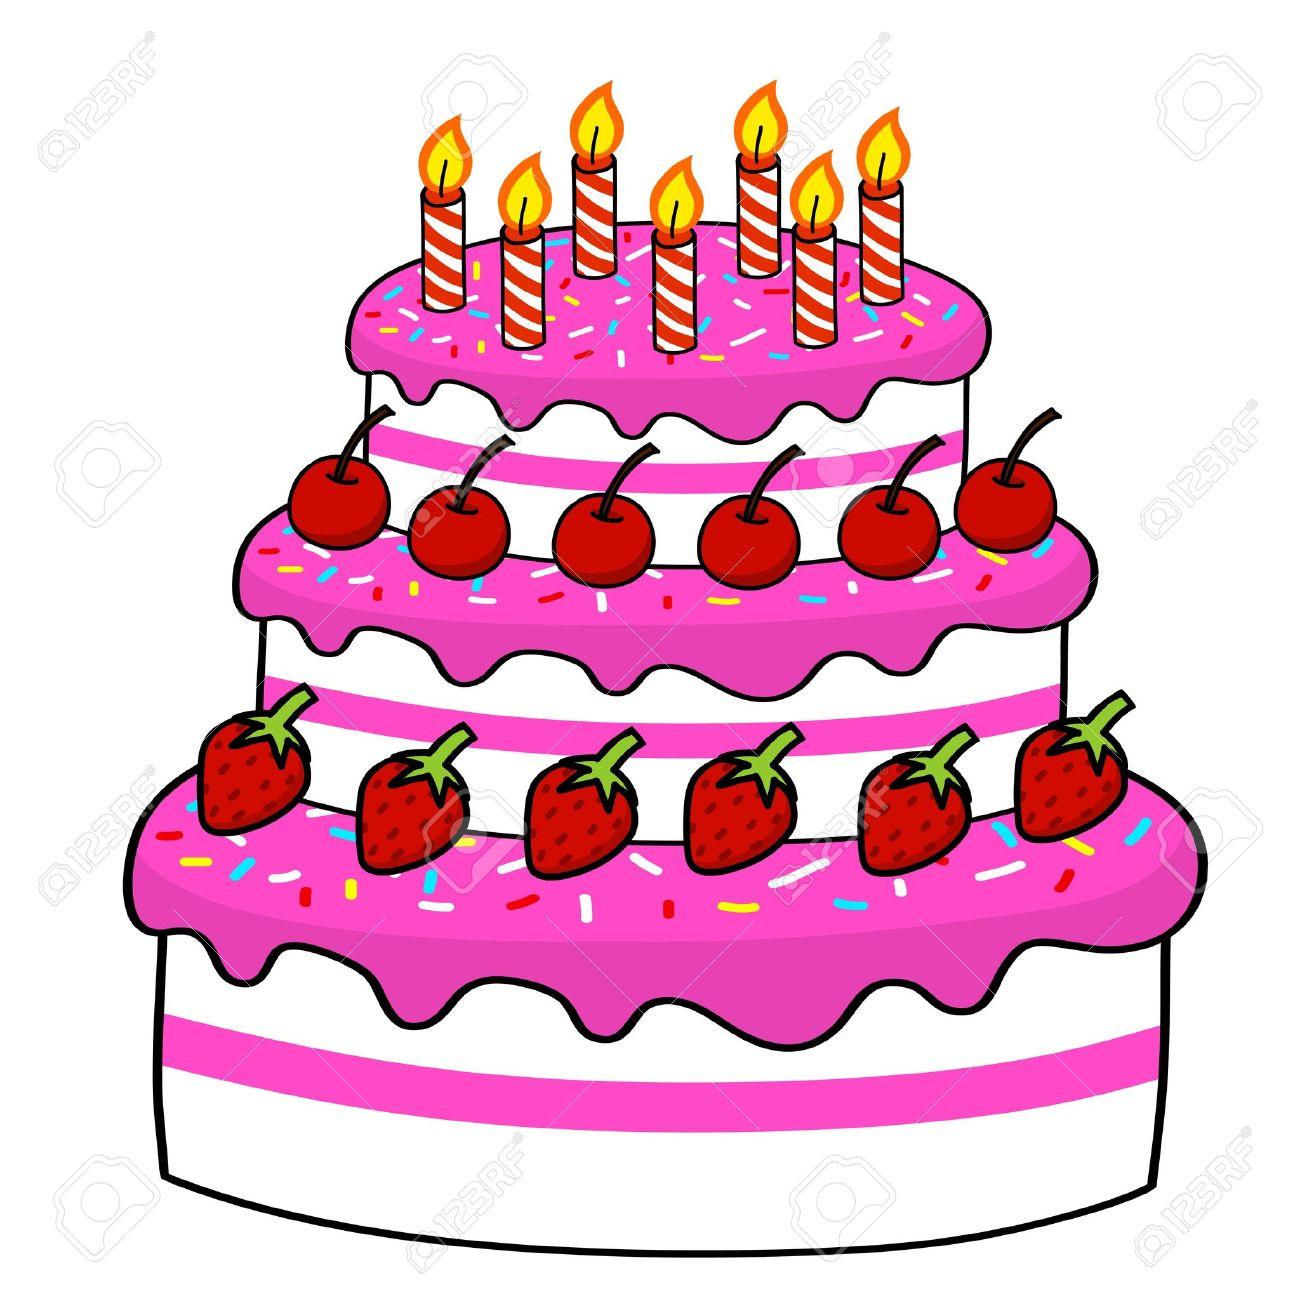 Cartoon Cake Hand Drawing Vector Royalty Free Cliparts Vectors